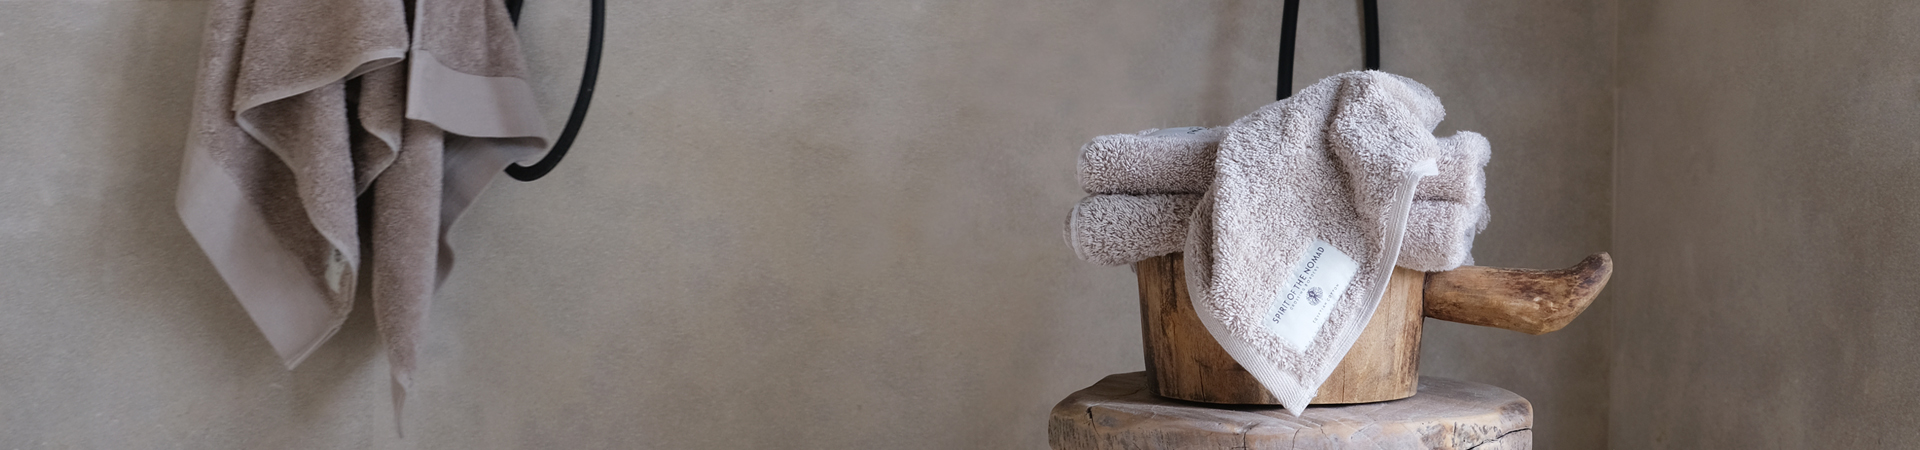 Spirit of the Nomad towel set